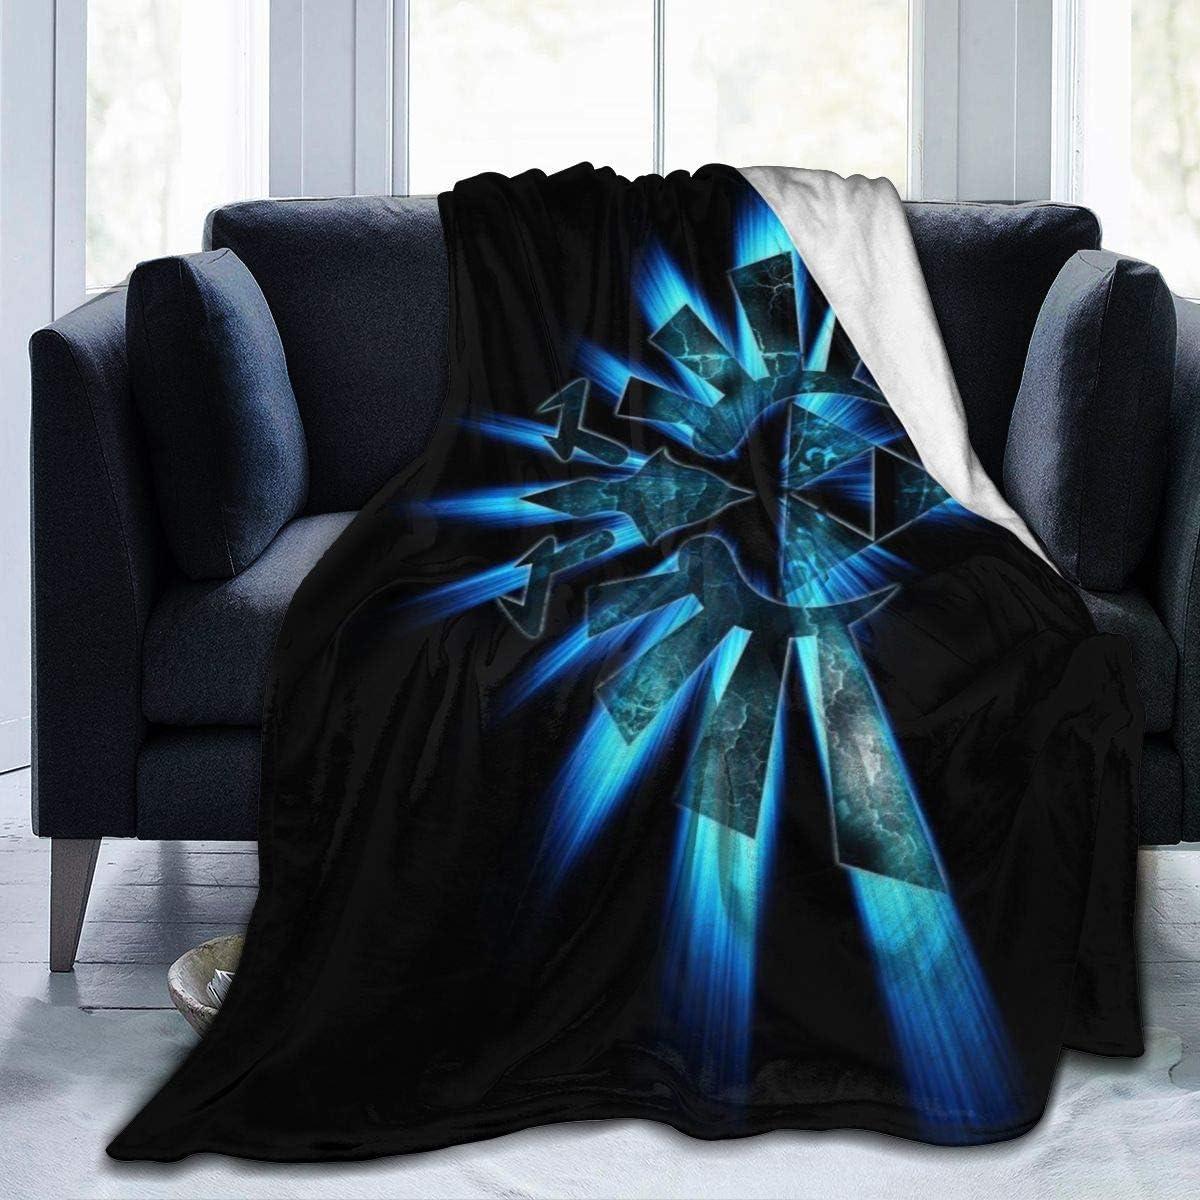 VigorPow Legend sale Discount mail order of Zelda Blanket Ultra Throw Soft B Micro Fleece